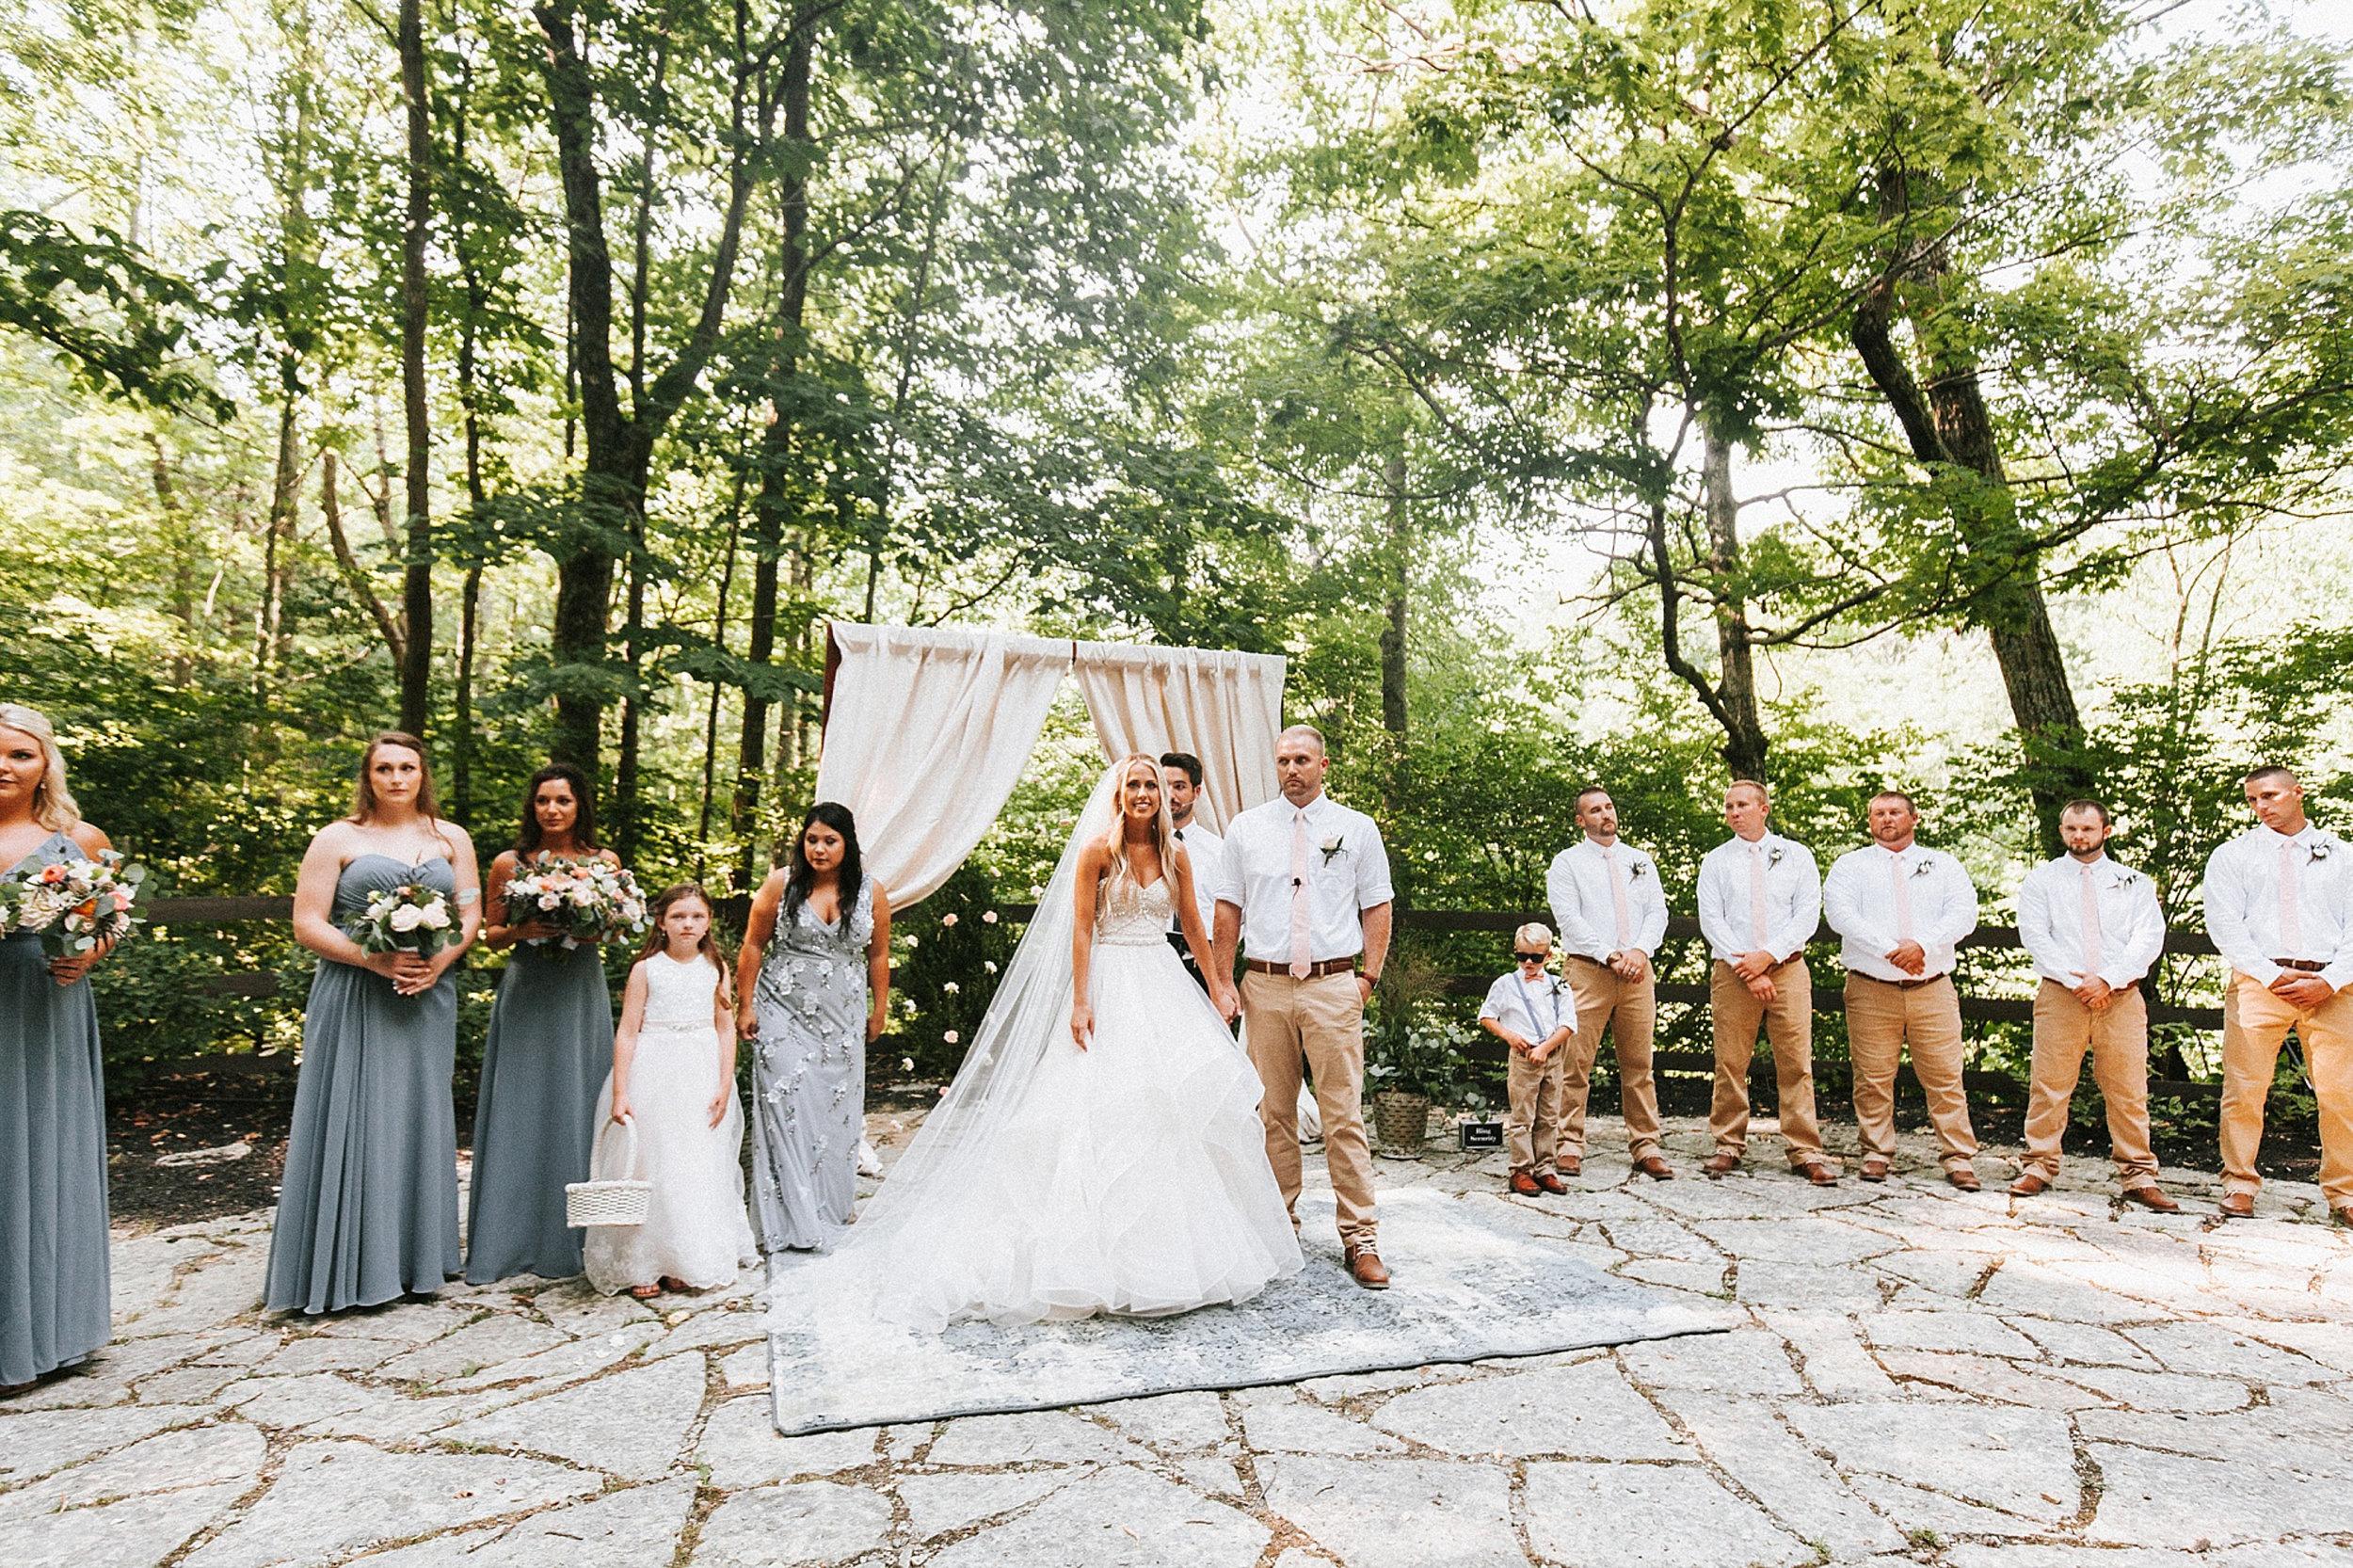 Brooke Townsend Photography - Cincinnati Wedding Photographer (76 of 153).jpg